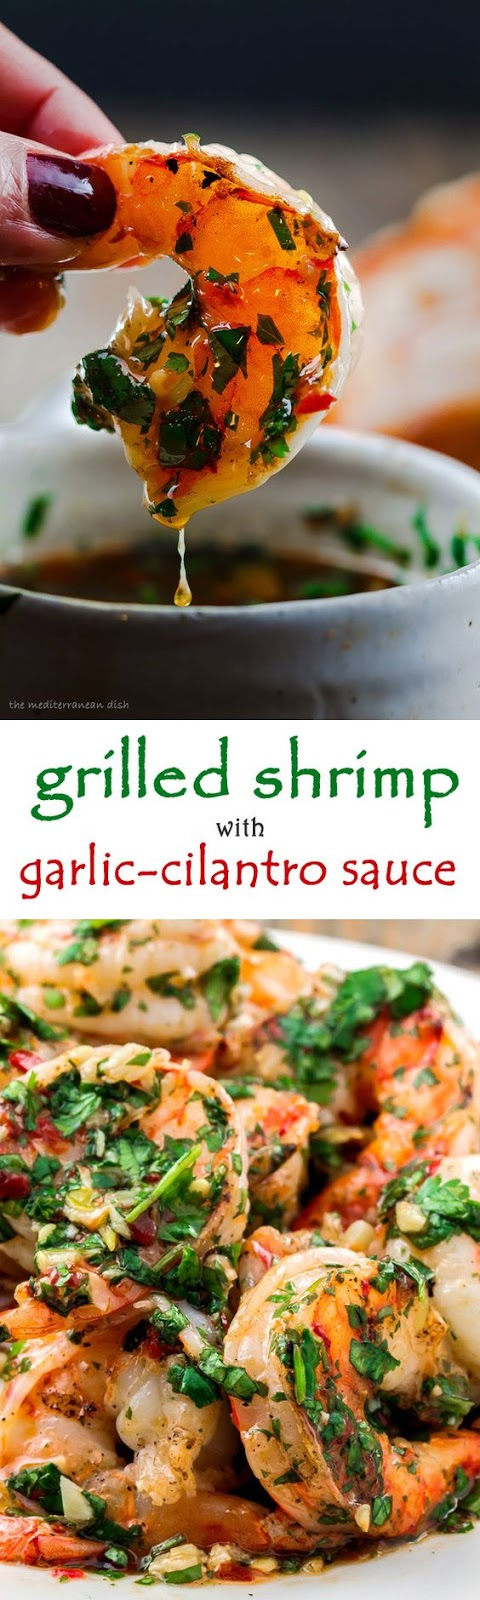 Grilled Shrimp Recipe with Roasted Garlic-Cilantro Sauce